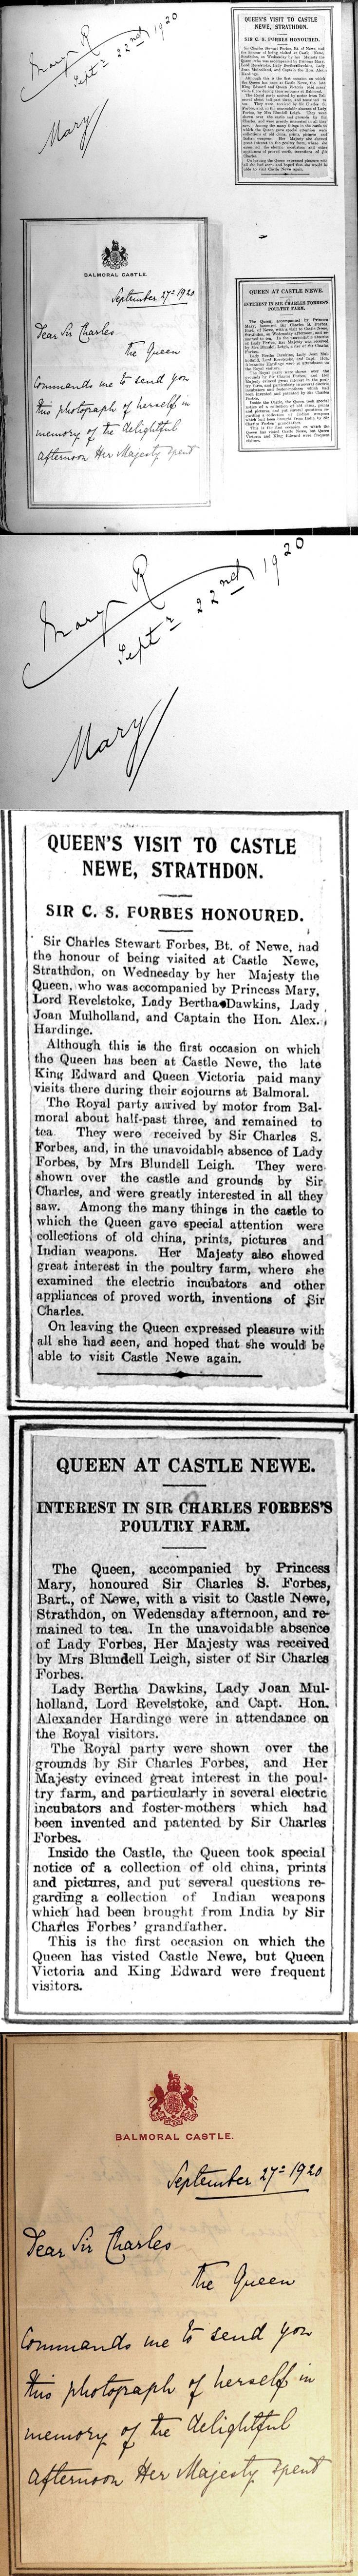 46 Castle Newe Visitors Book 1920